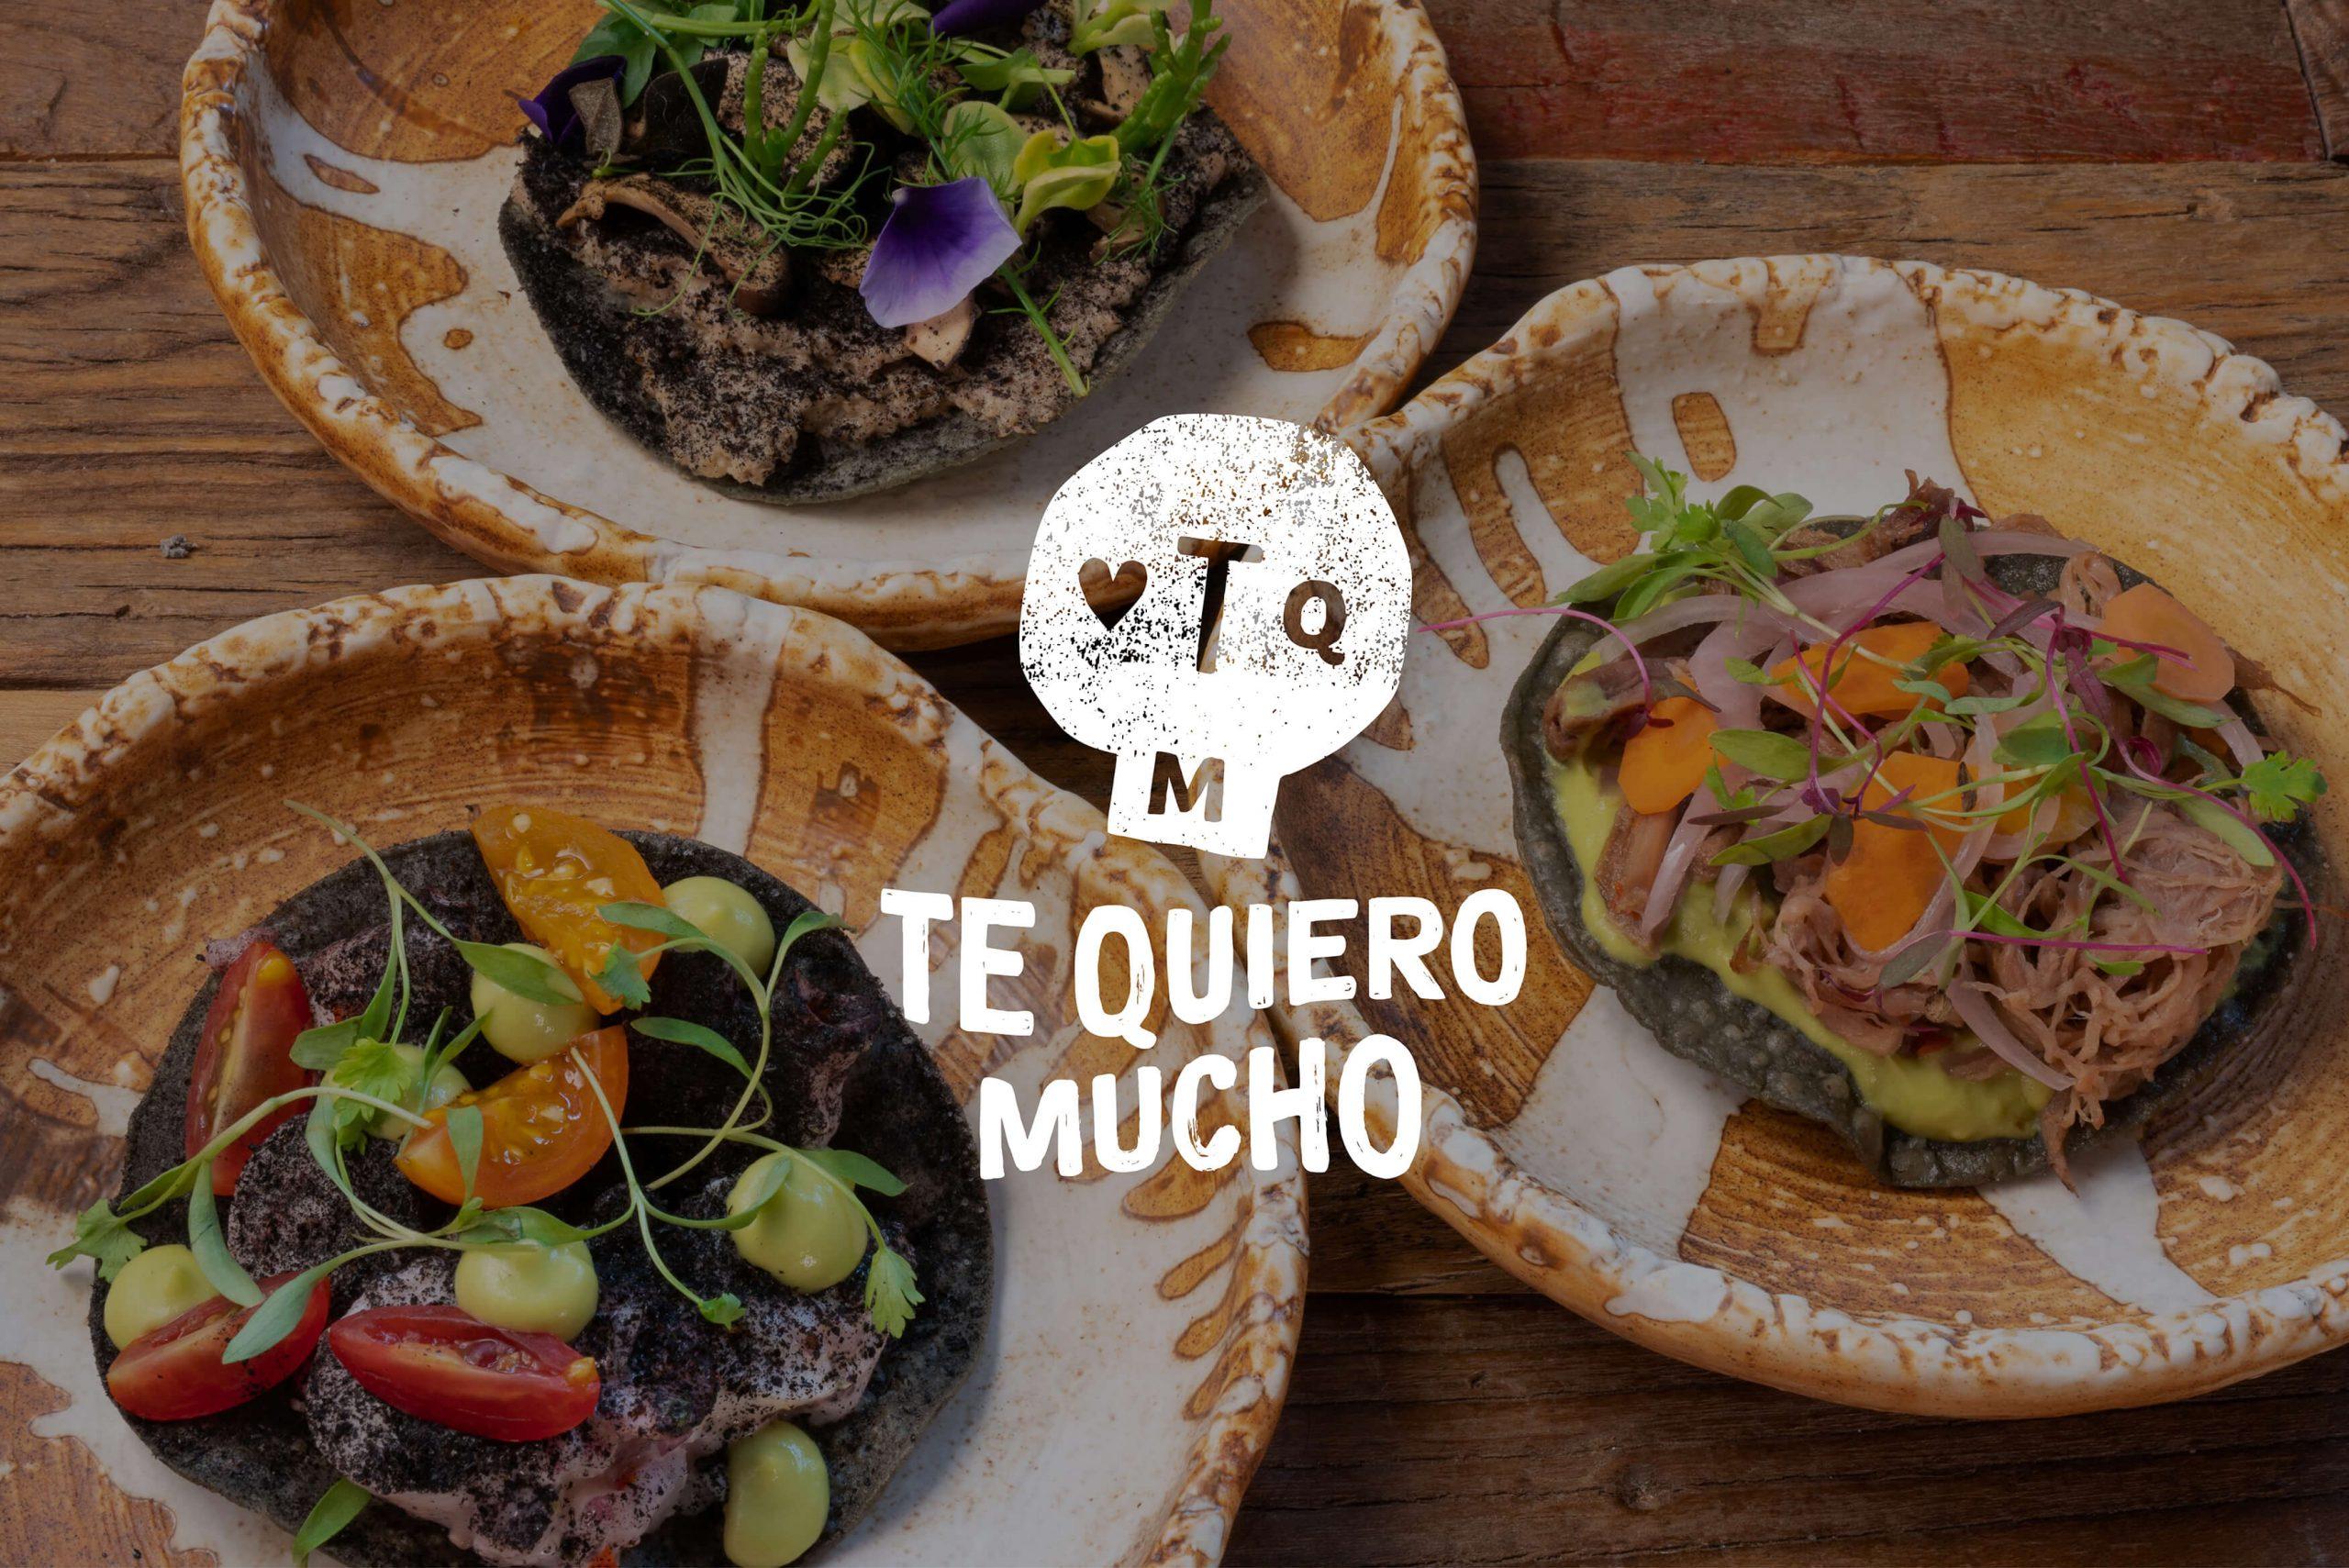 Ovolo Te Quiero Mucho Hospitality Identity - Logotype on food photography